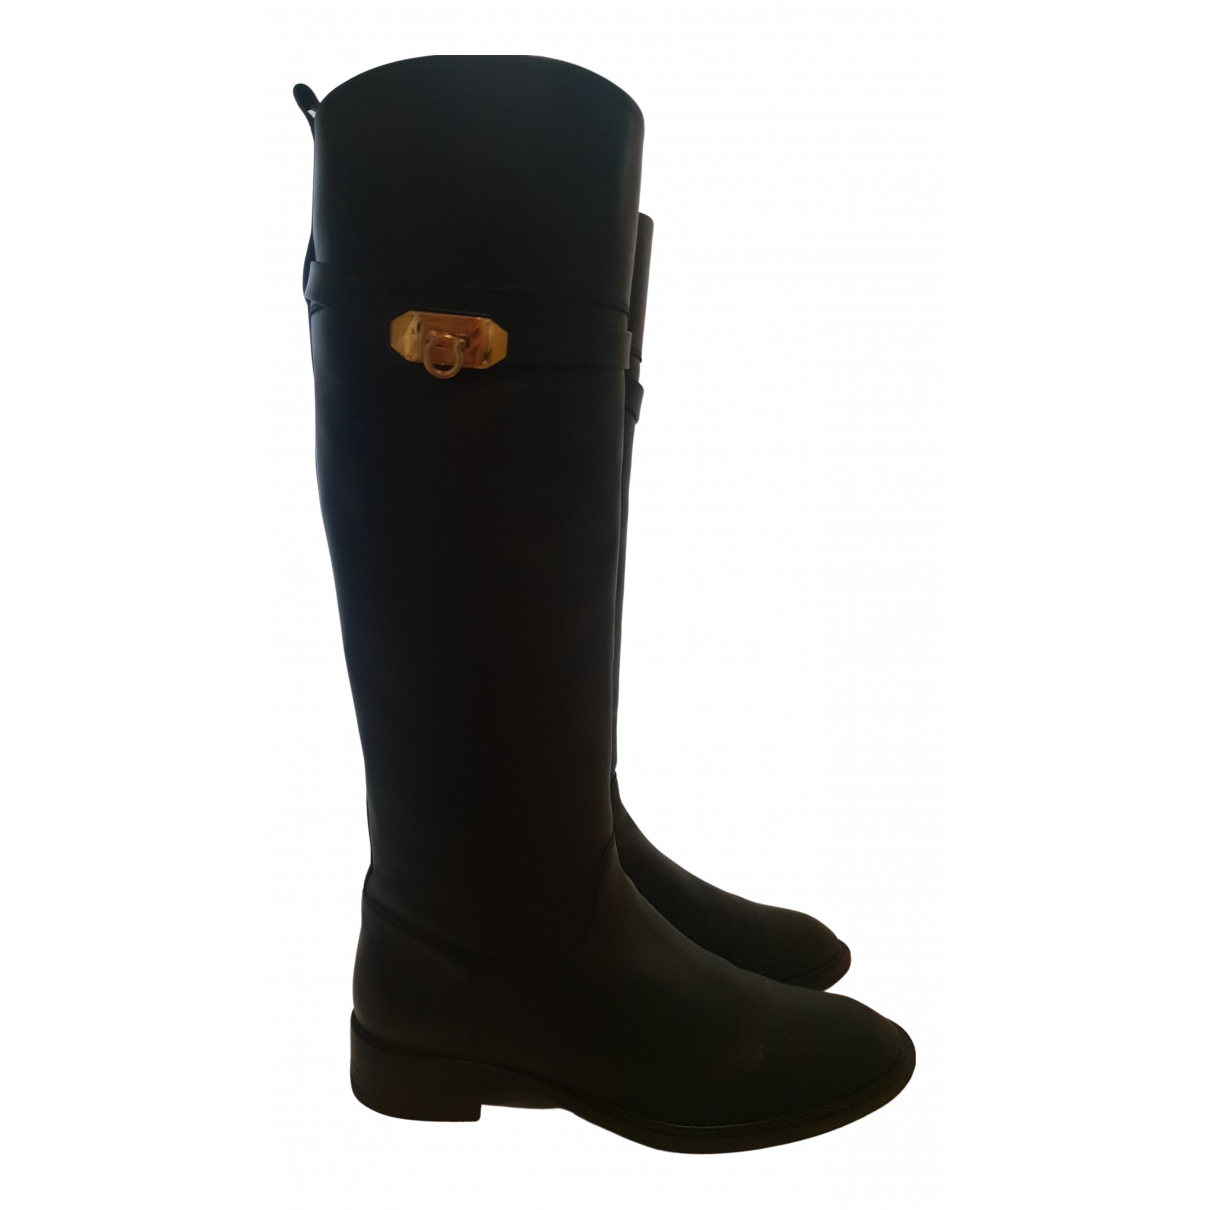 Salvatore Ferragamo N Black Leather Boots for Women 39 EU